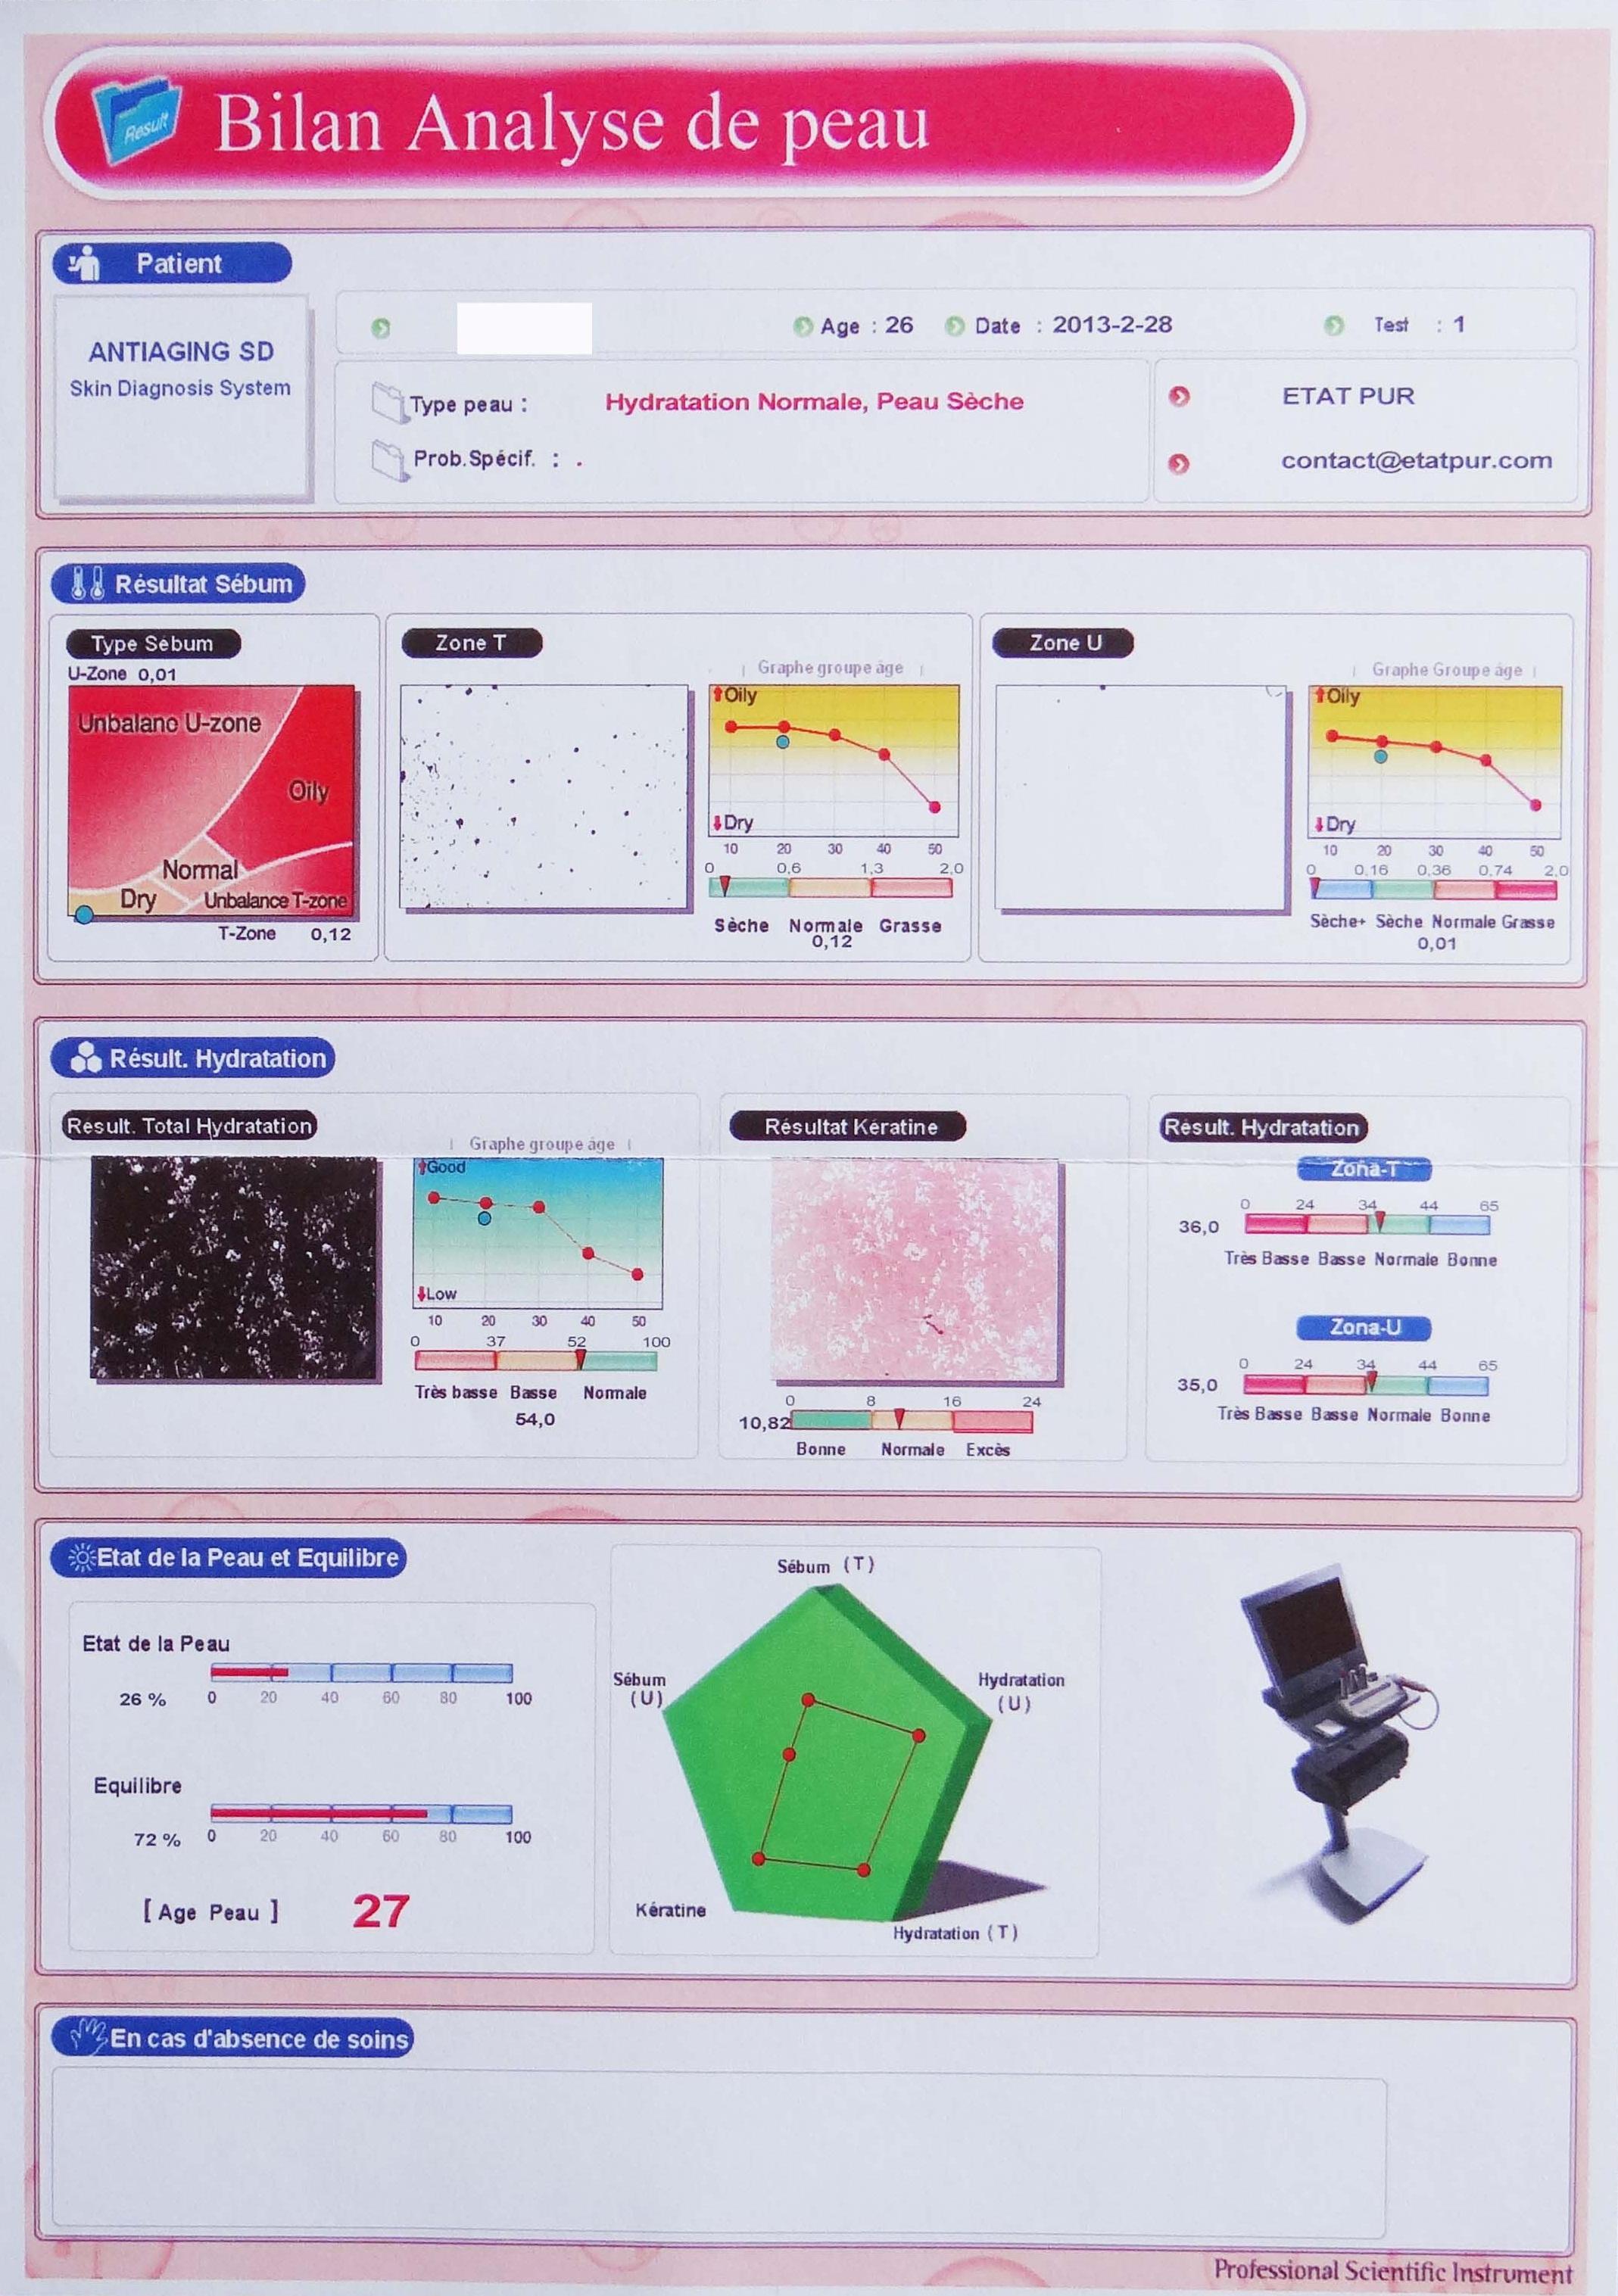 etat-pur-bilan-analyse-de-peau